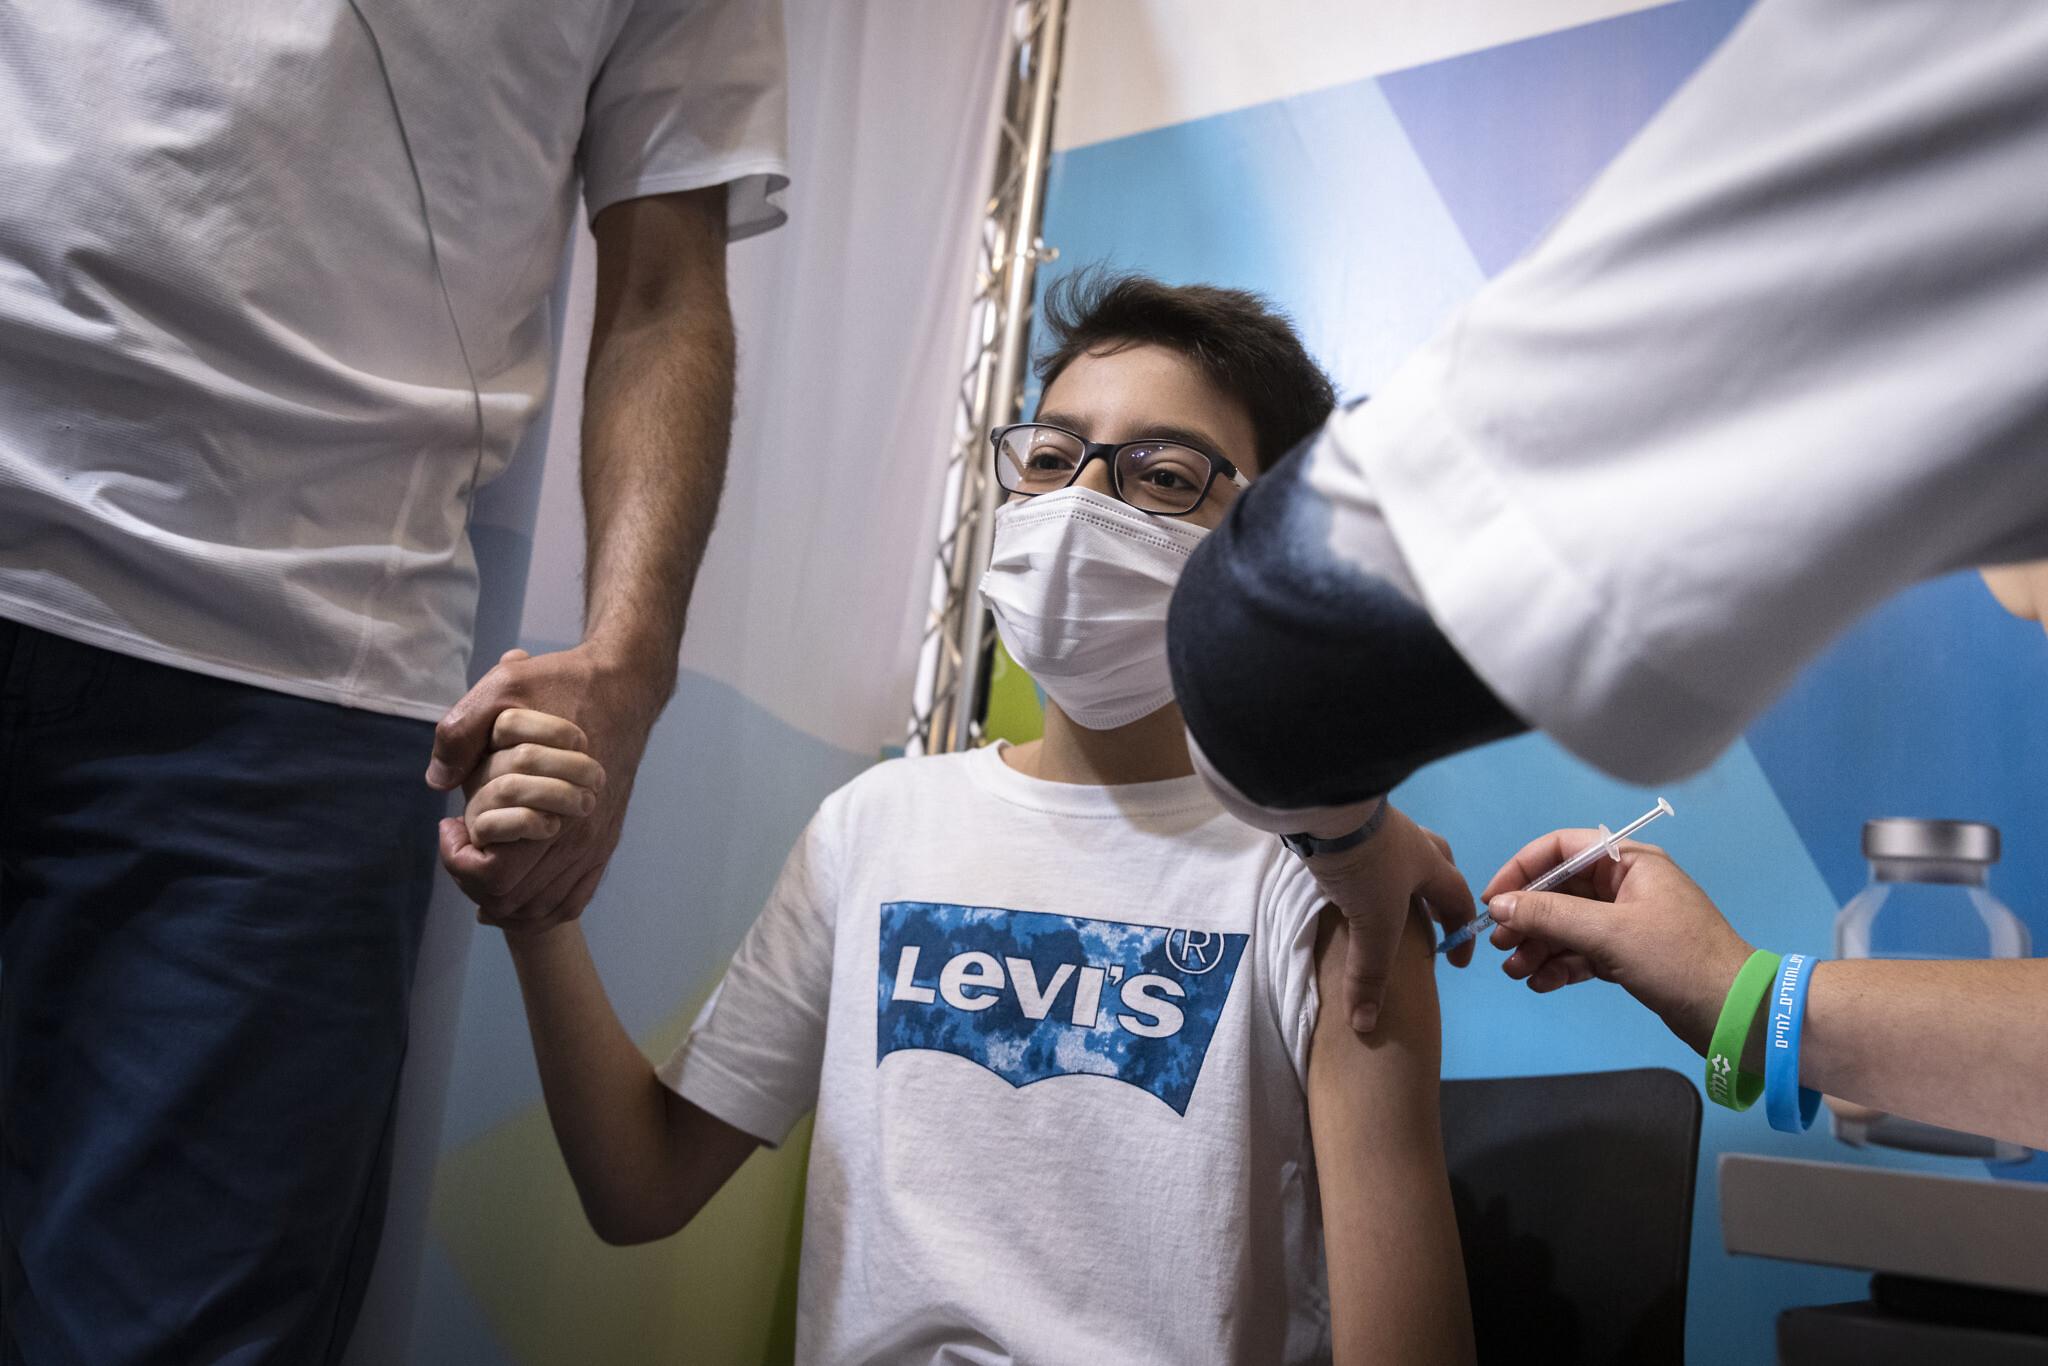 Pfizer Says COVID-19 Vaccine Safe for Children 5-11